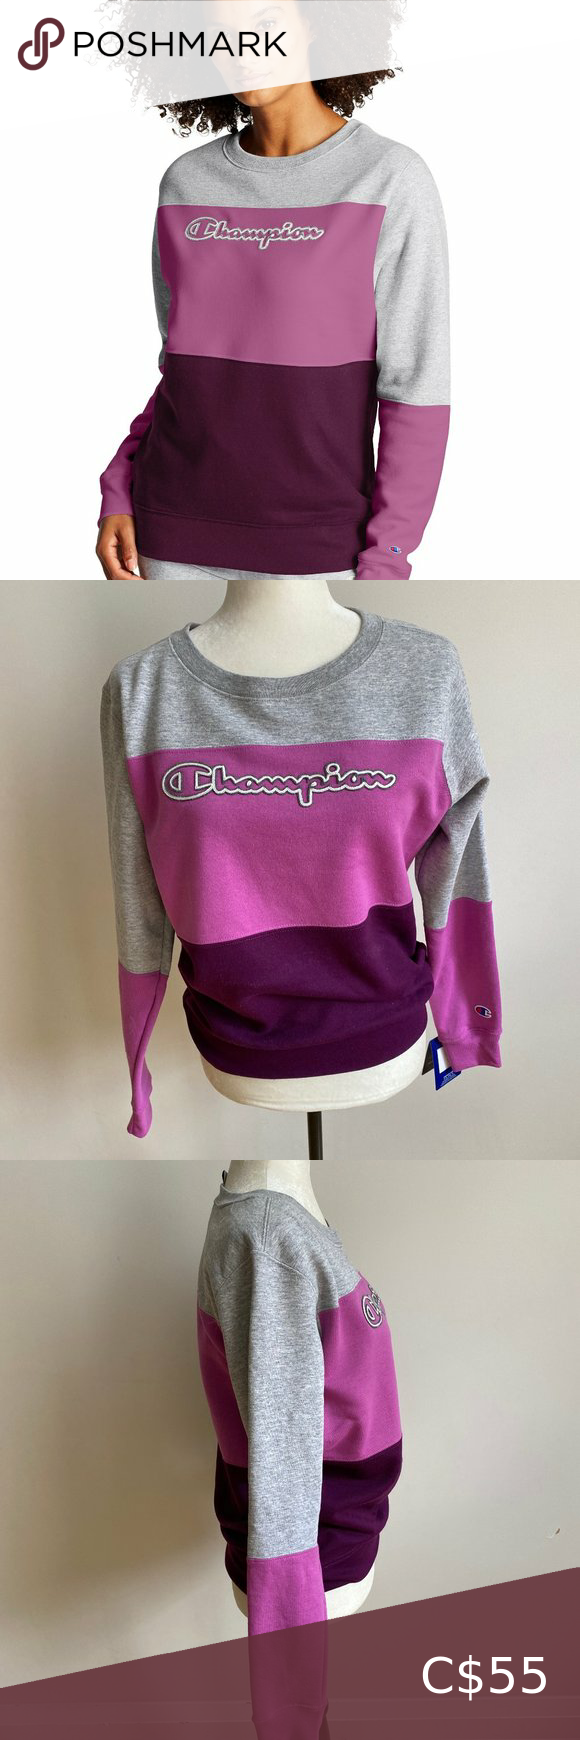 Champion Colourblock Sweatshirt Bnwt Xs Purple Sweatshirts Sweaters For Women Black Champion Hoodie [ 1740 x 580 Pixel ]